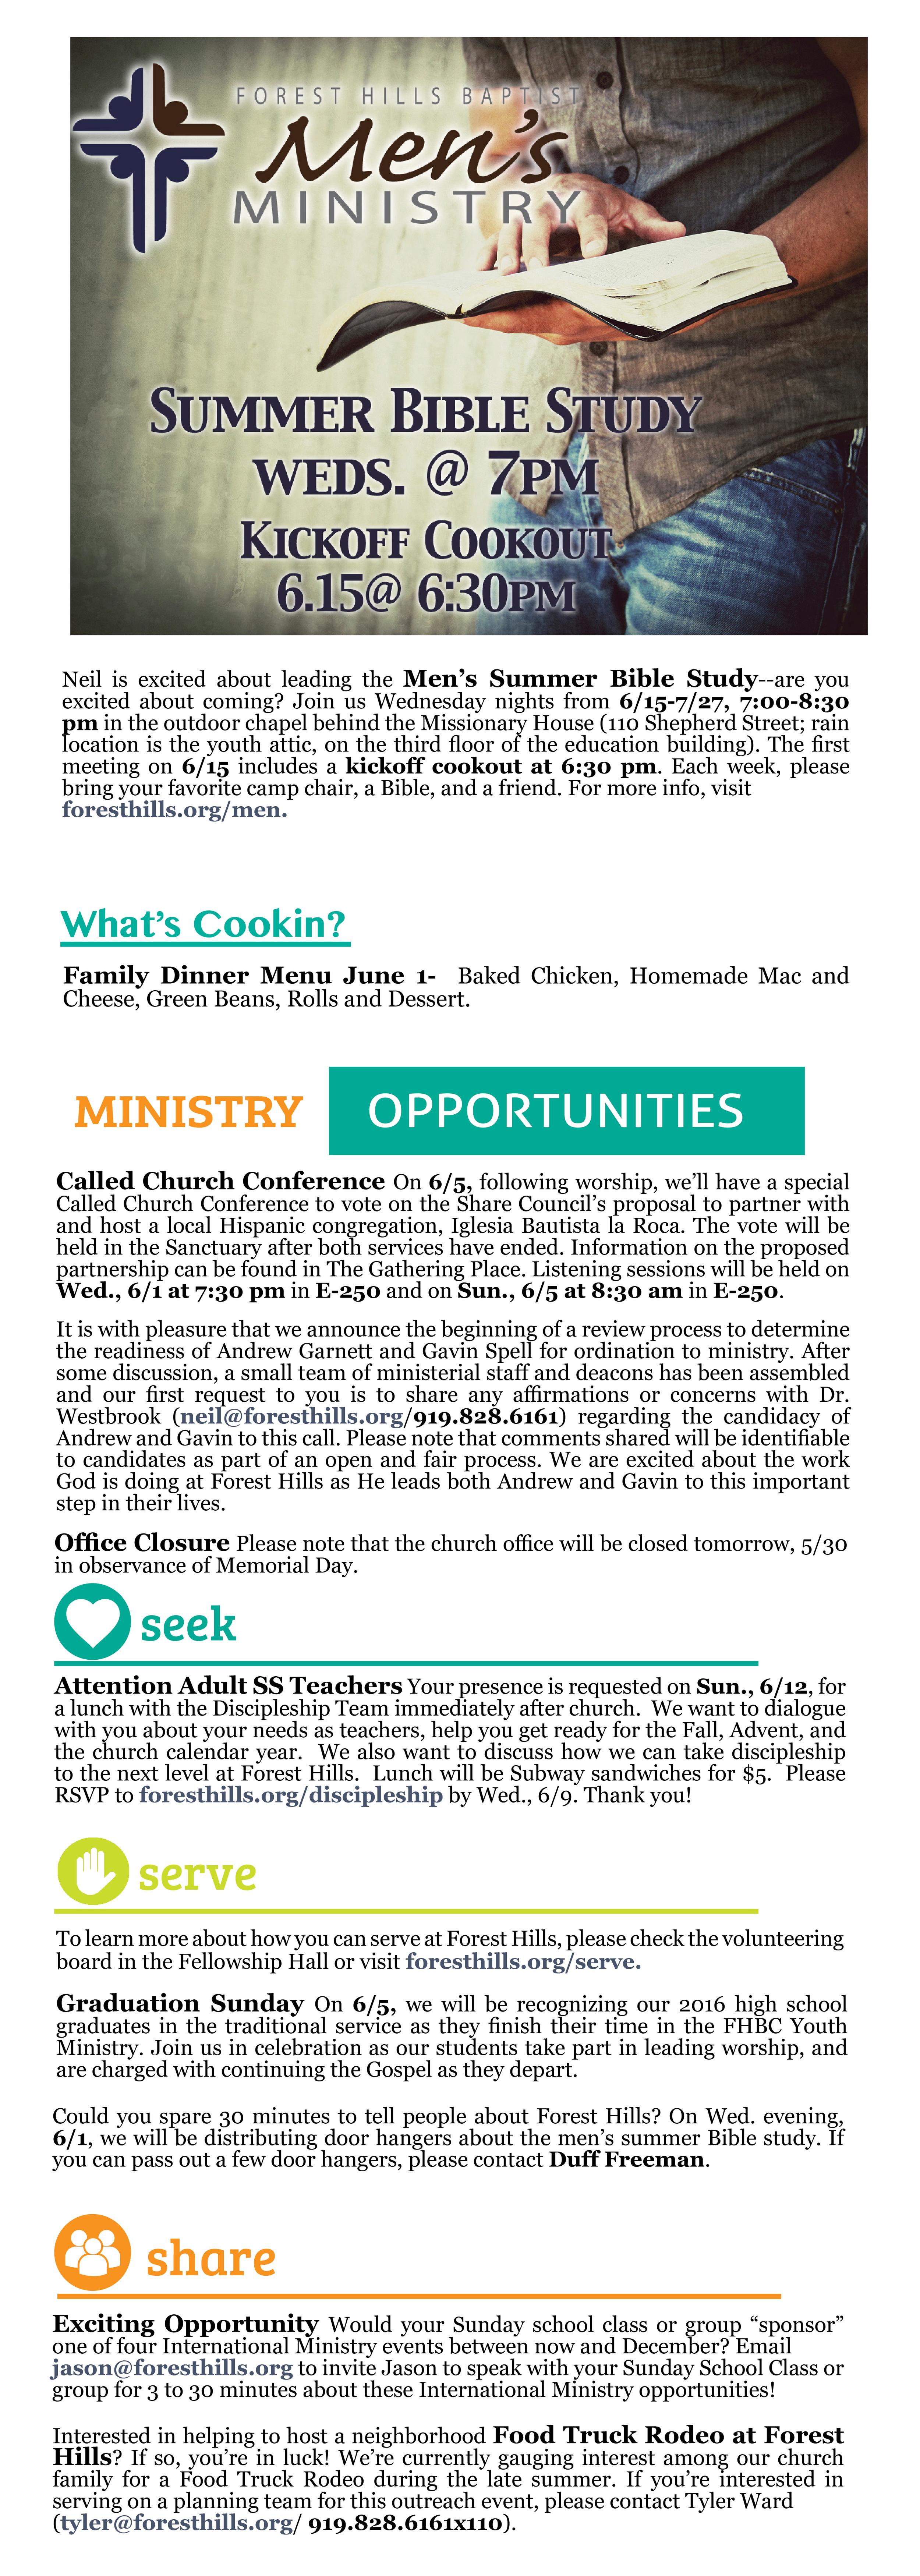 Forest hills baptist church weekly update